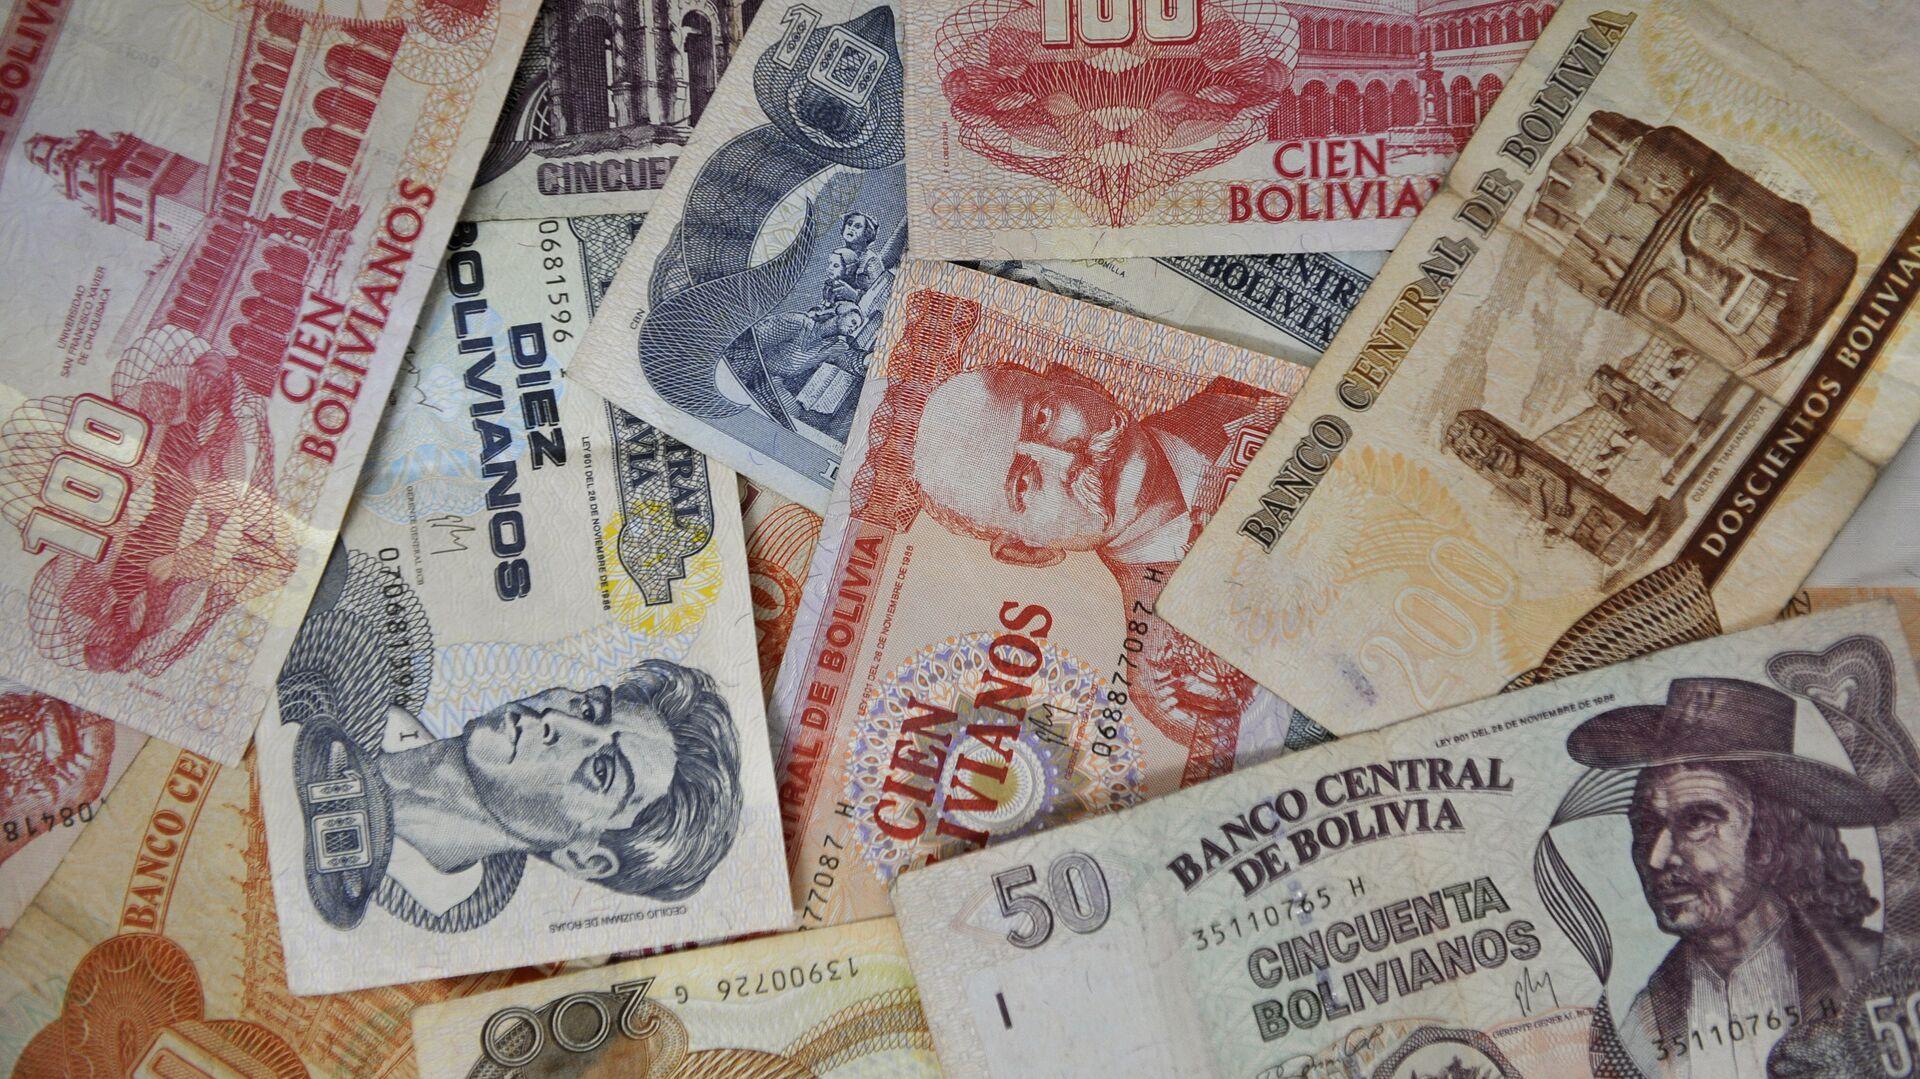 Bolivianos (billetes) - Sputnik Mundo, 1920, 30.04.2021